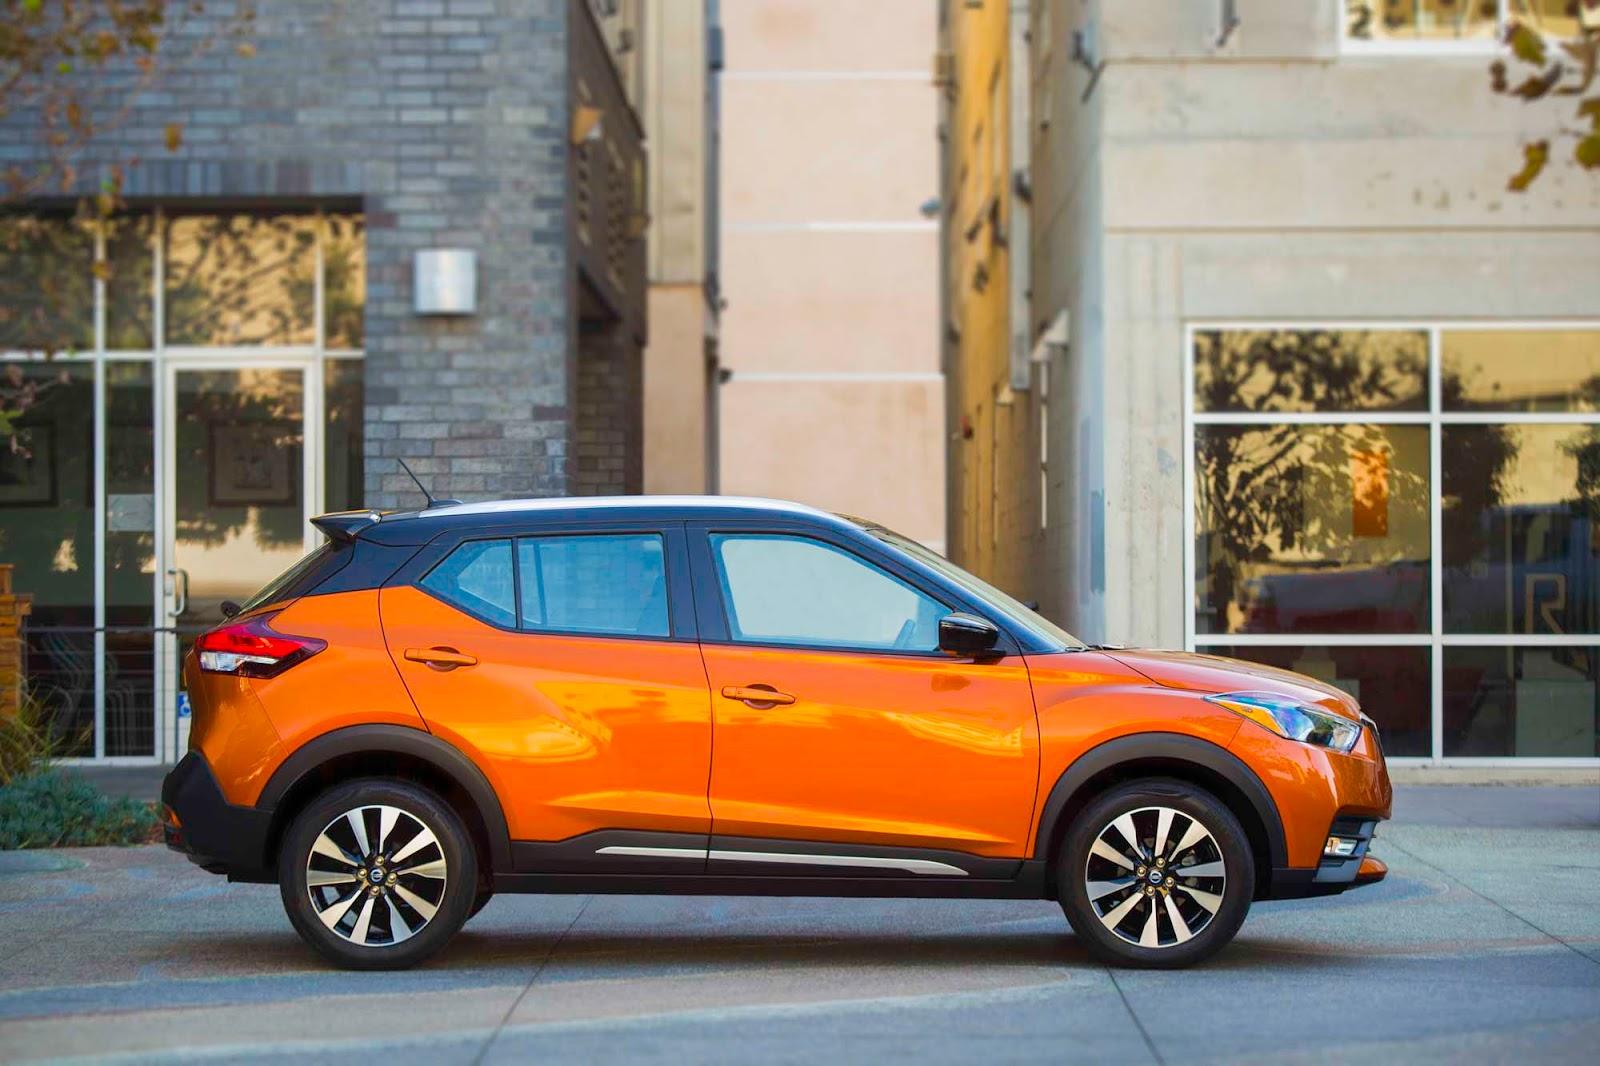 Nissan Kicks Πρωταθλητές οικονομίας 4 μοντέλα της Nissan Nissan, βραβείο, καινούργιο, καινούρια, καινούριο, κατανάλωση